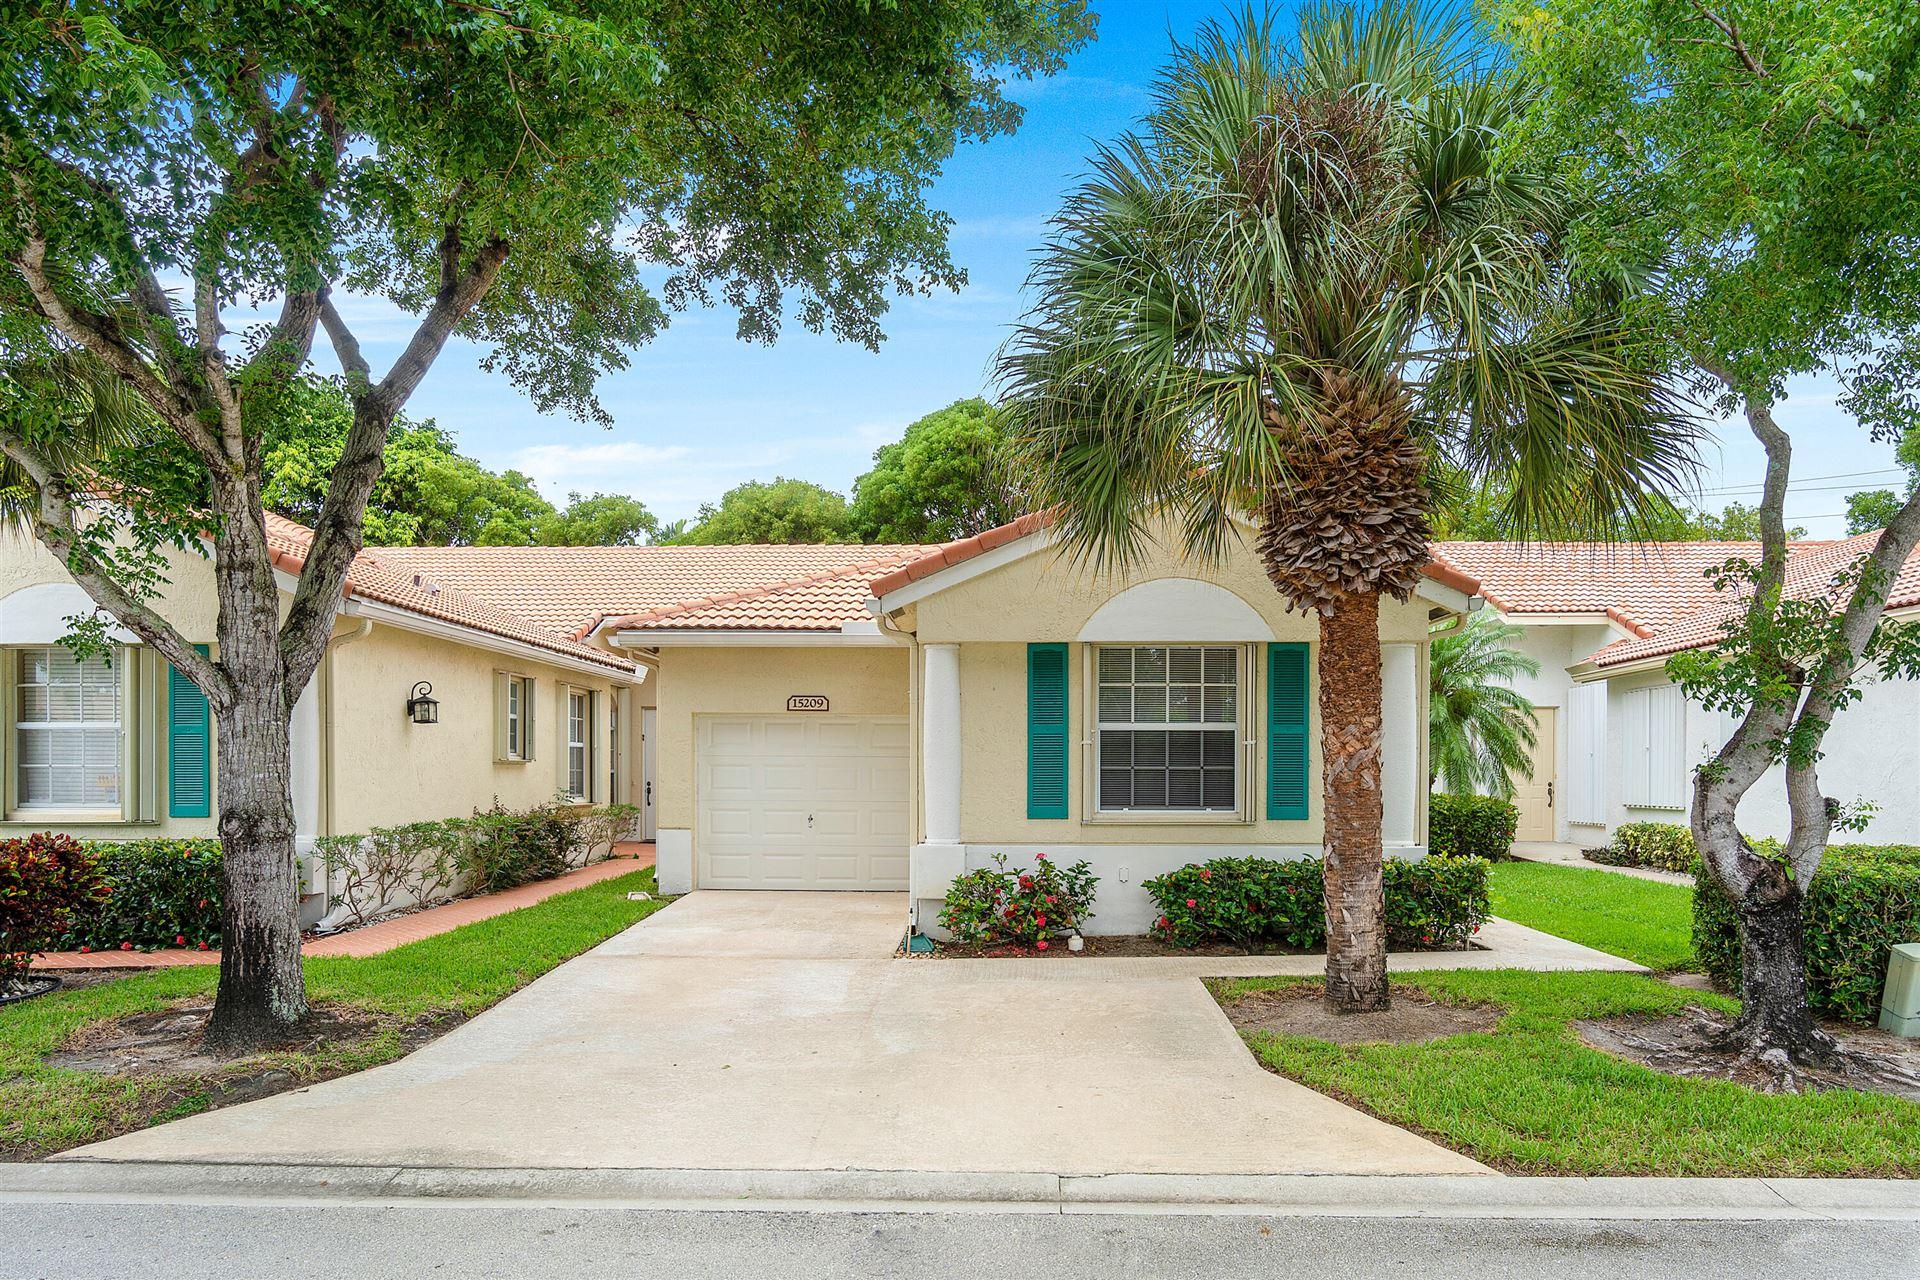 15209 Ixora Road, Delray Beach, FL 33484 - MLS#: RX-10729688